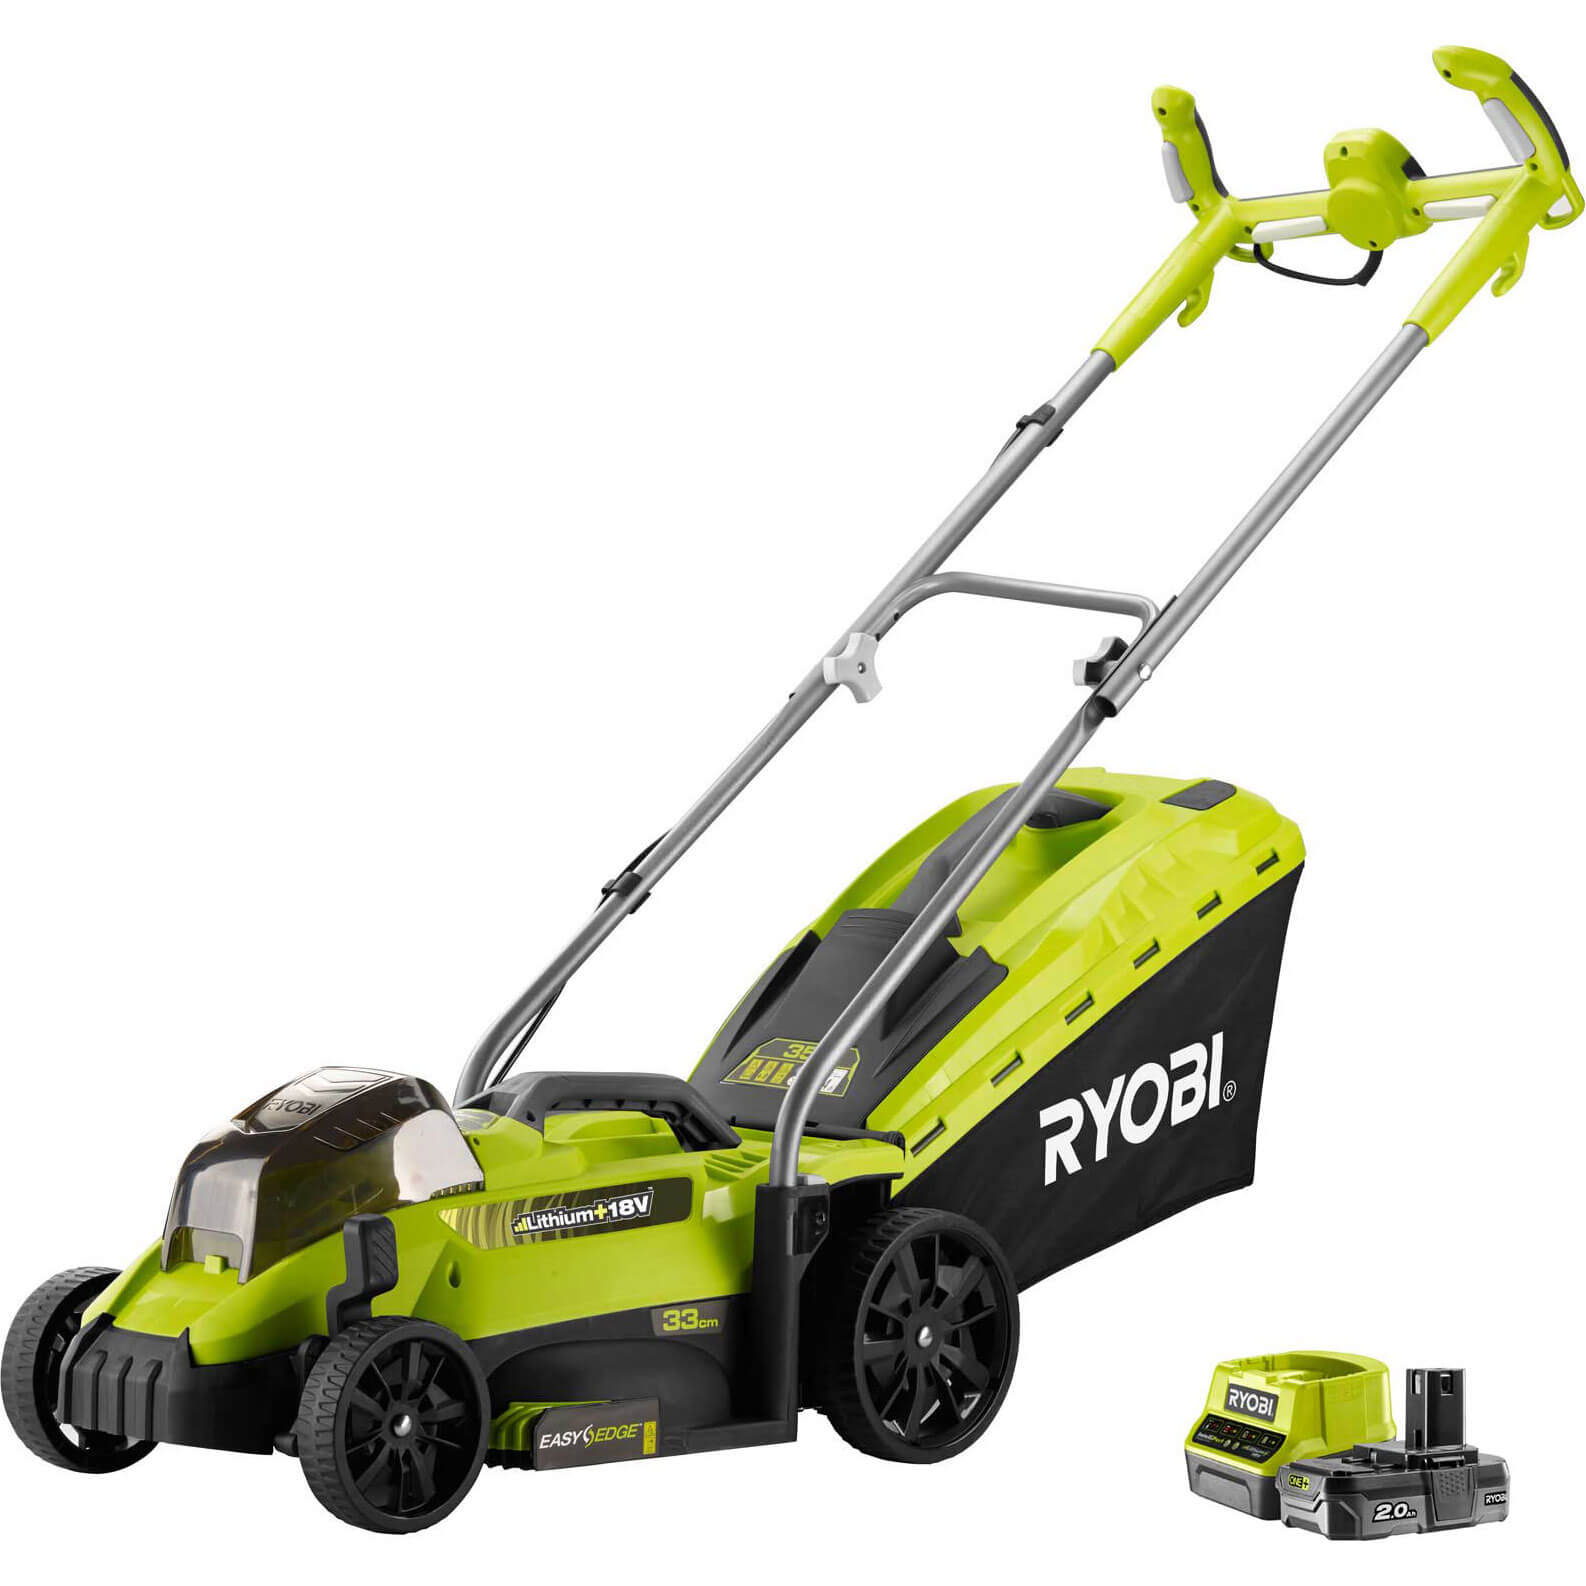 Image of Ryobi OLM1833H ONE+ 18v Cordless Rotary Lawnmower 330mm 1 x 2ah Li-ion Charger